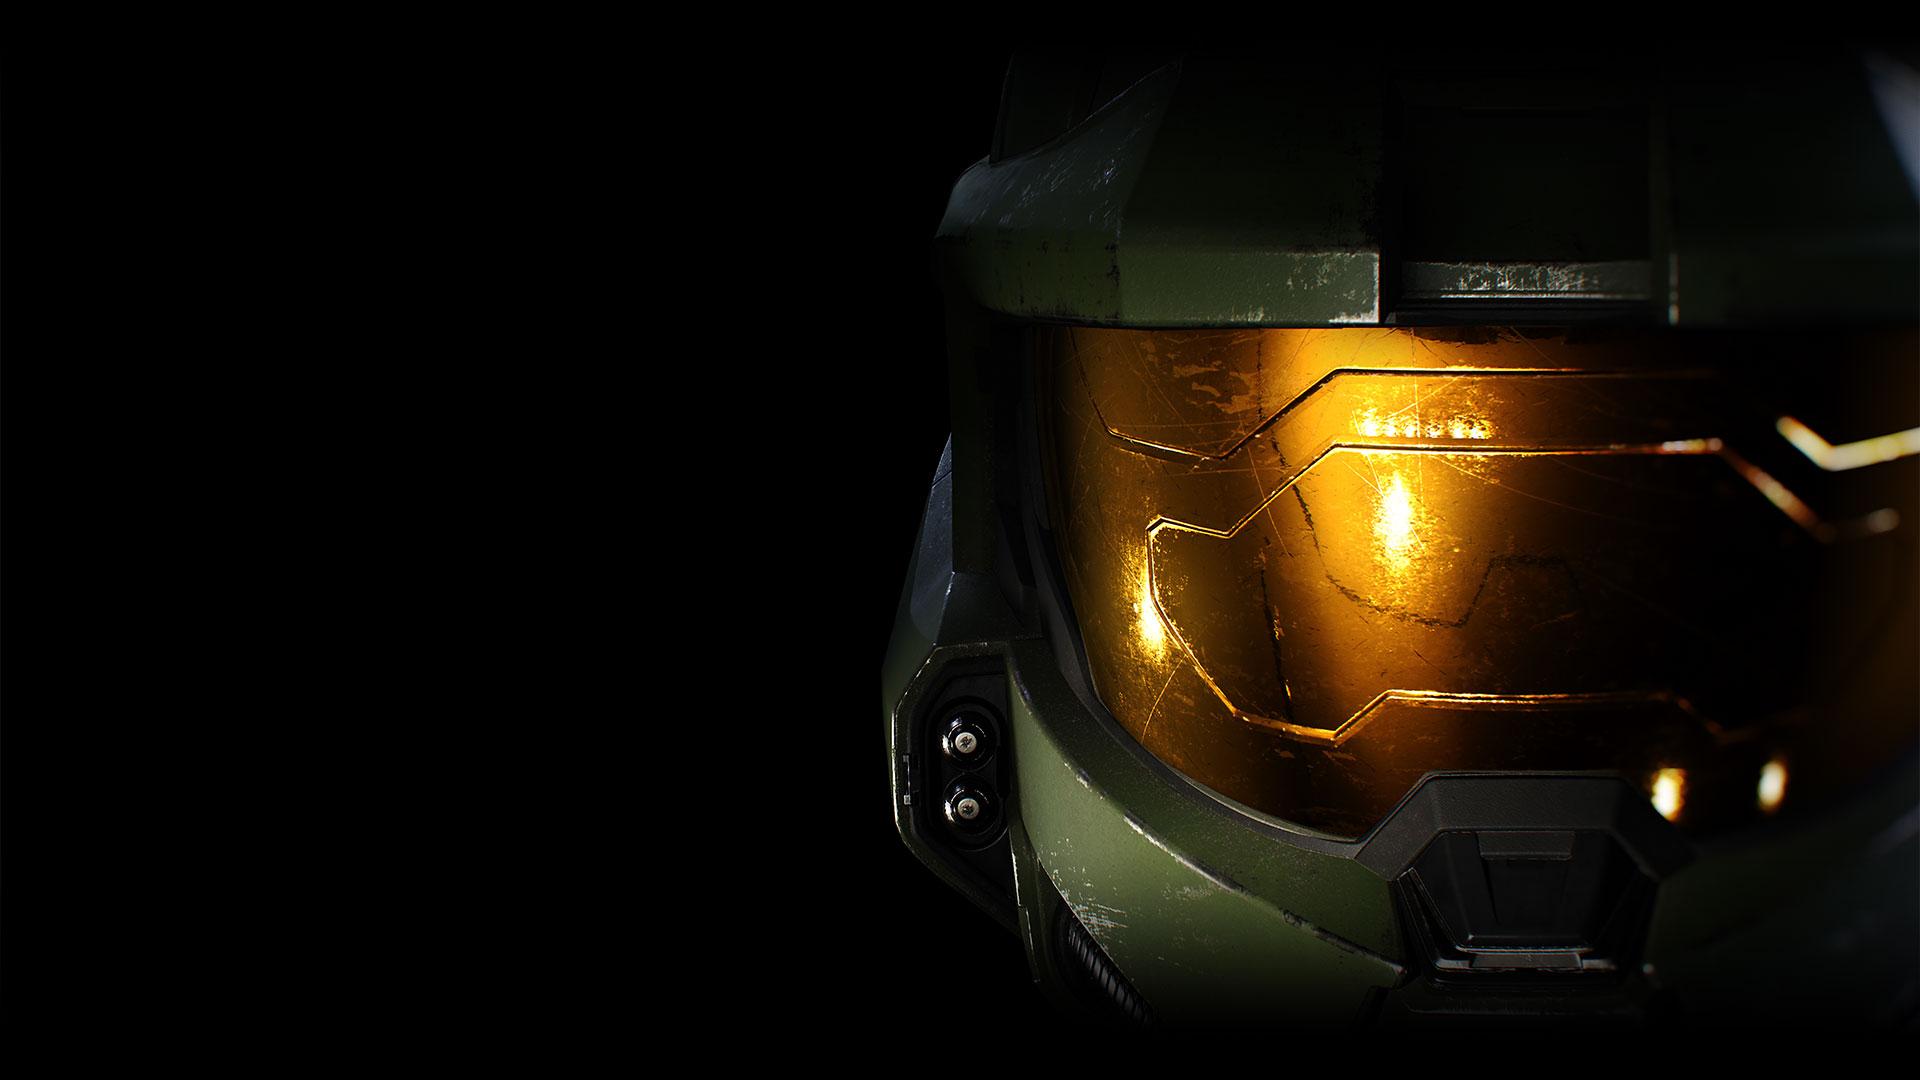 Primer plano del casco de un personaje de Halo